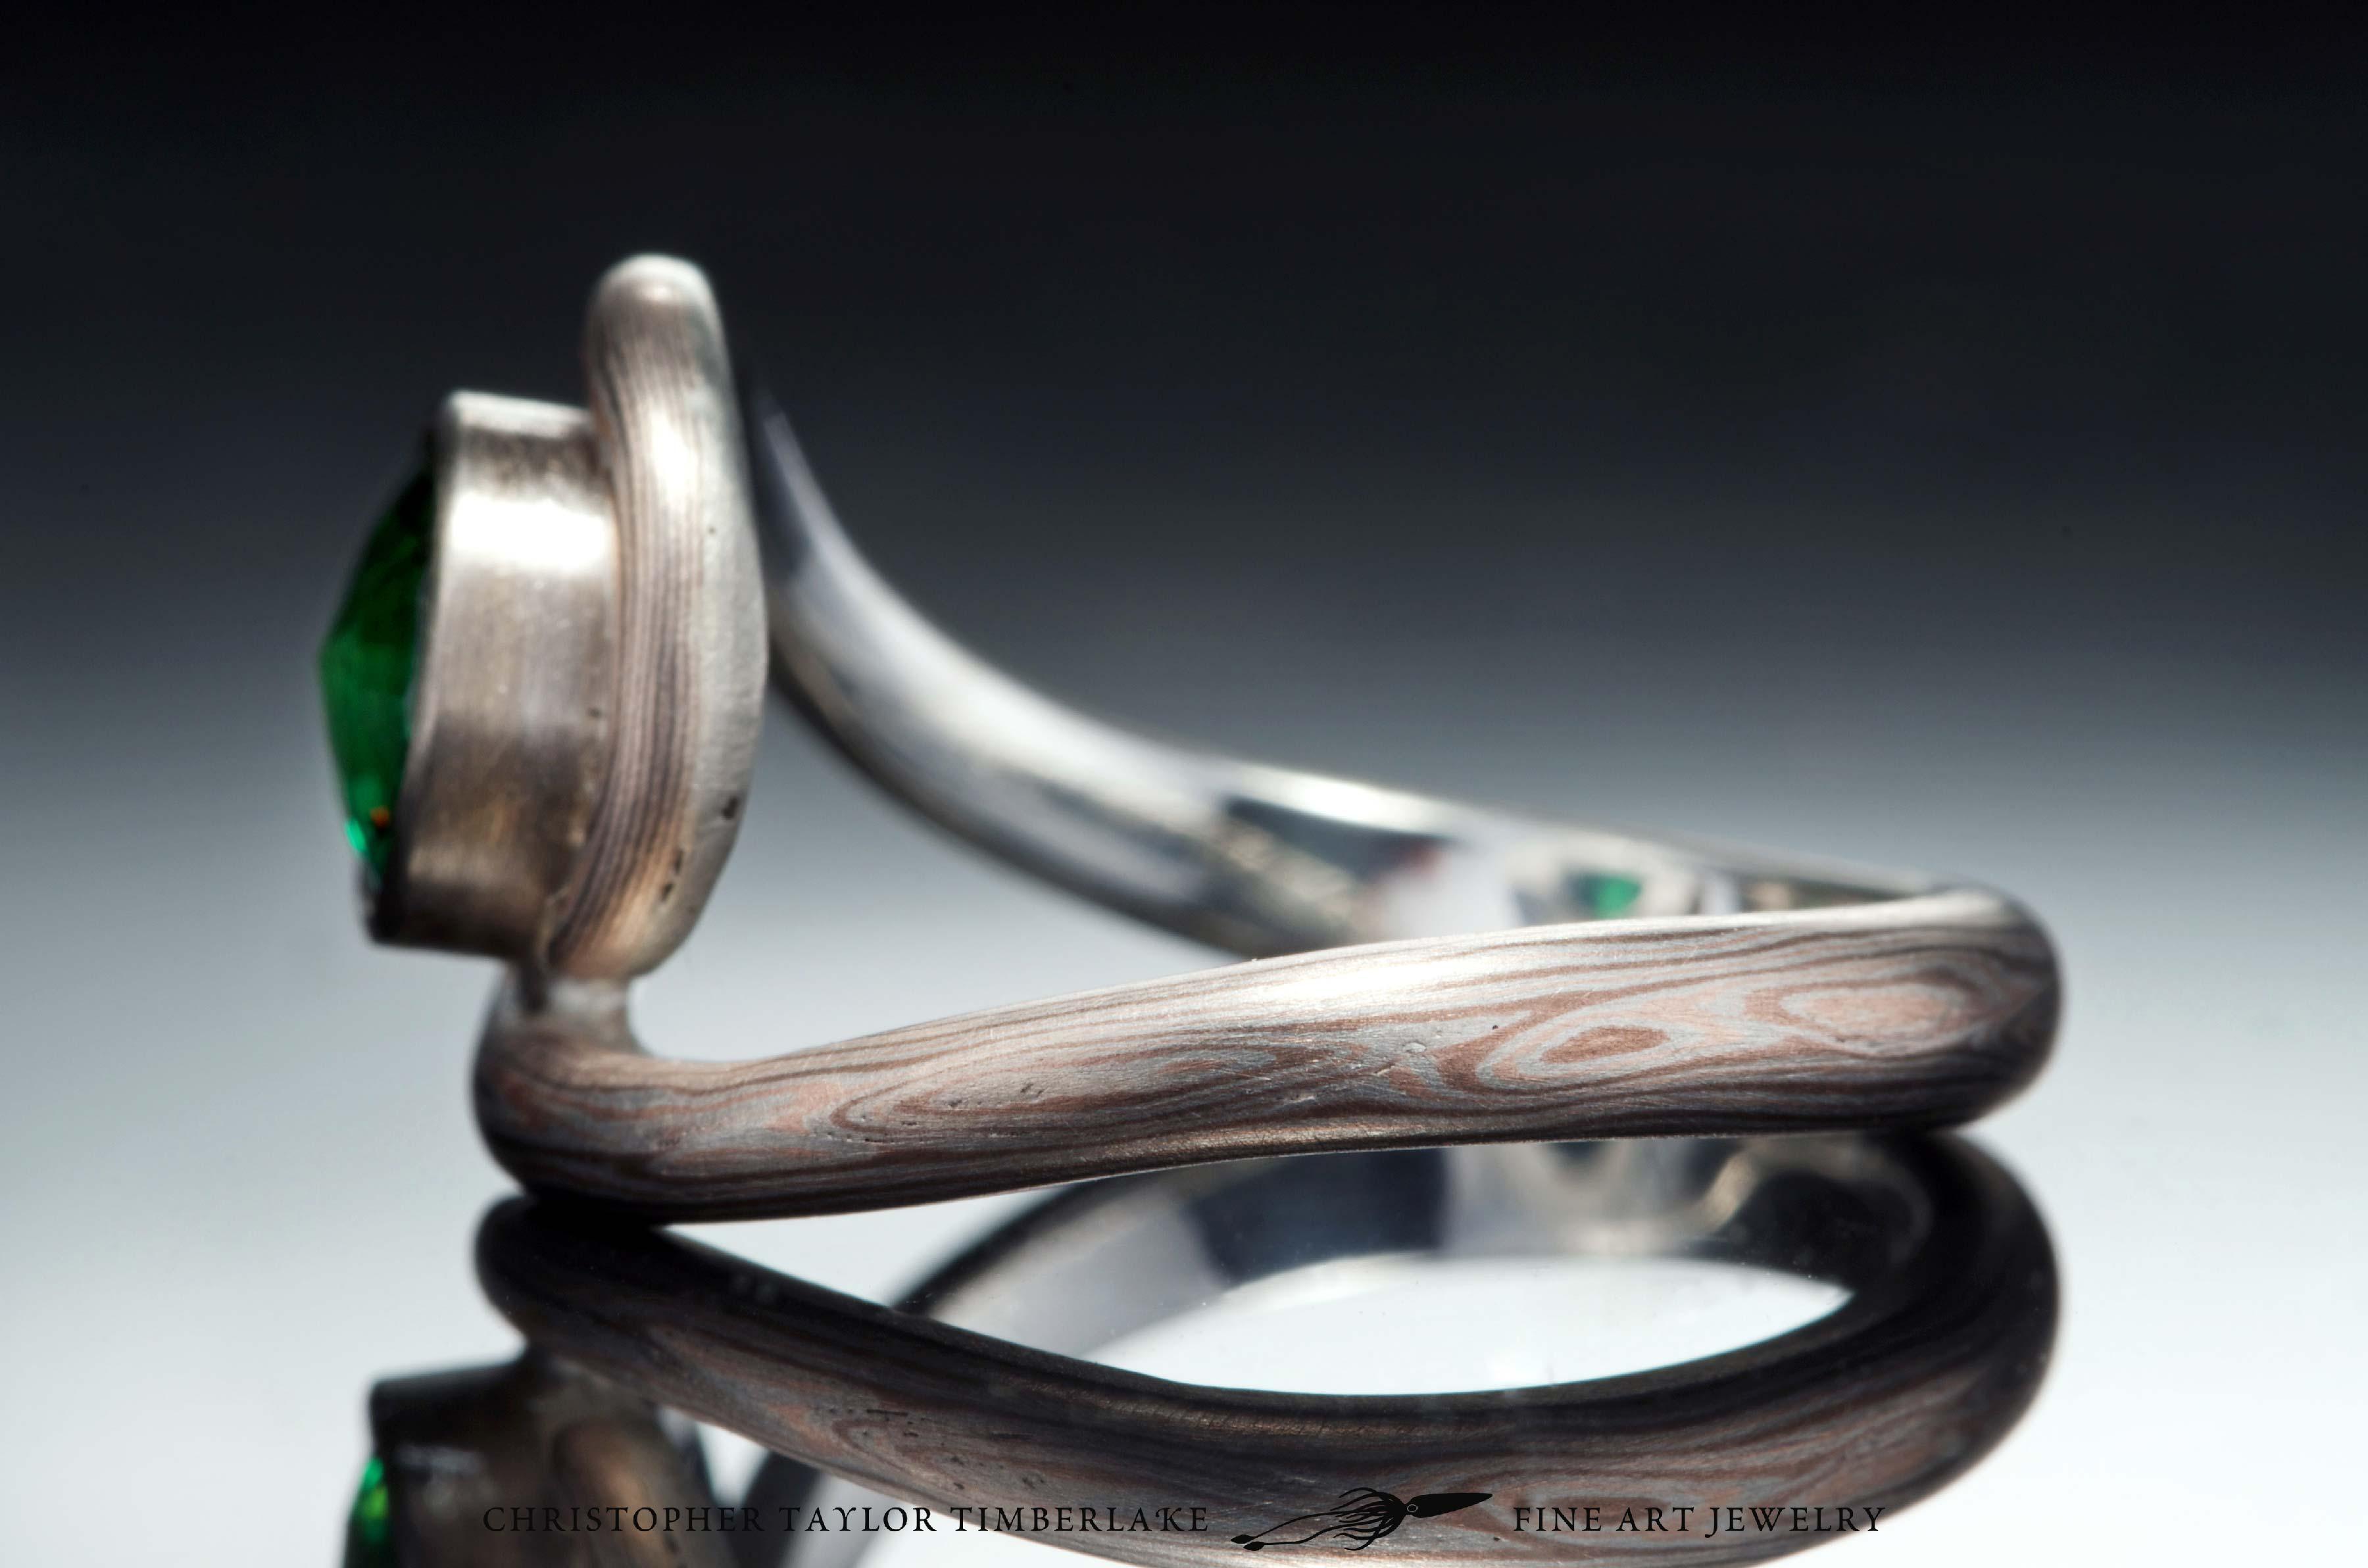 Mokume-(m81)-14-Karat-rose-gold,-shakudo-(2K),-and-sterling-silver-with-Palladium-and-6,31mm-modified-rose-cut-round-chrome-green-tourmaline-5